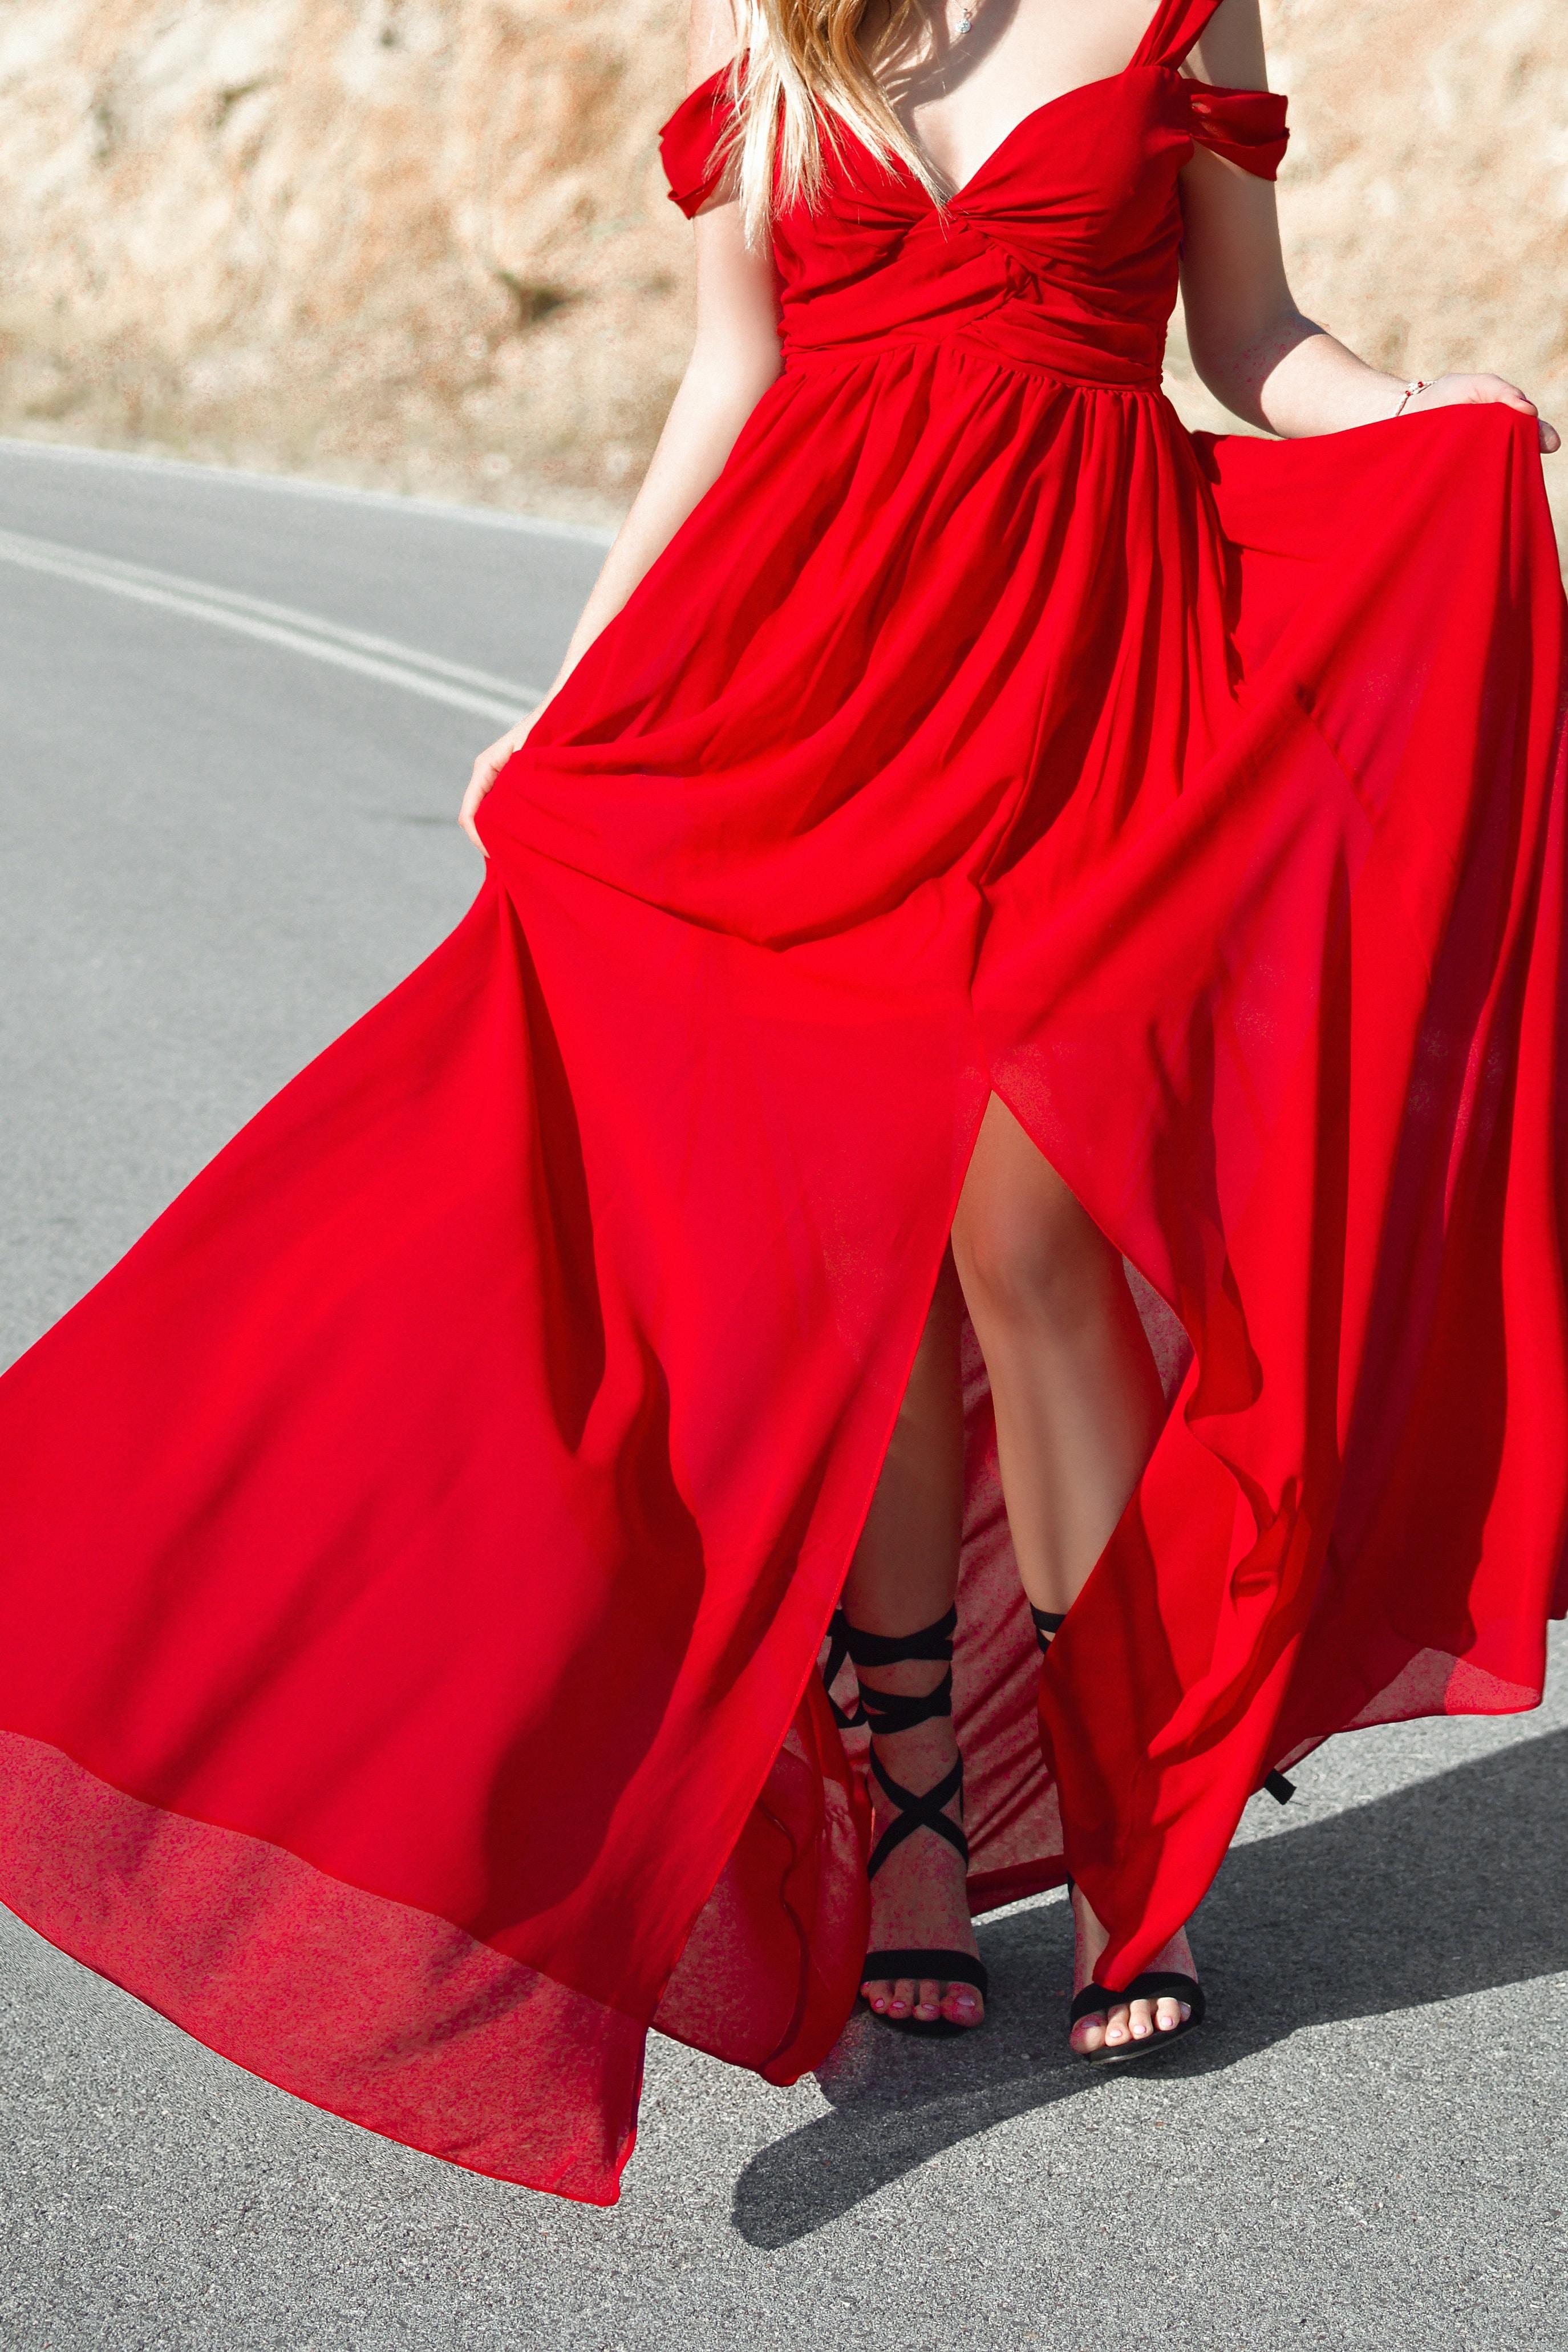 woman wearing red cold-shoulder front-slit formal dress standing on road